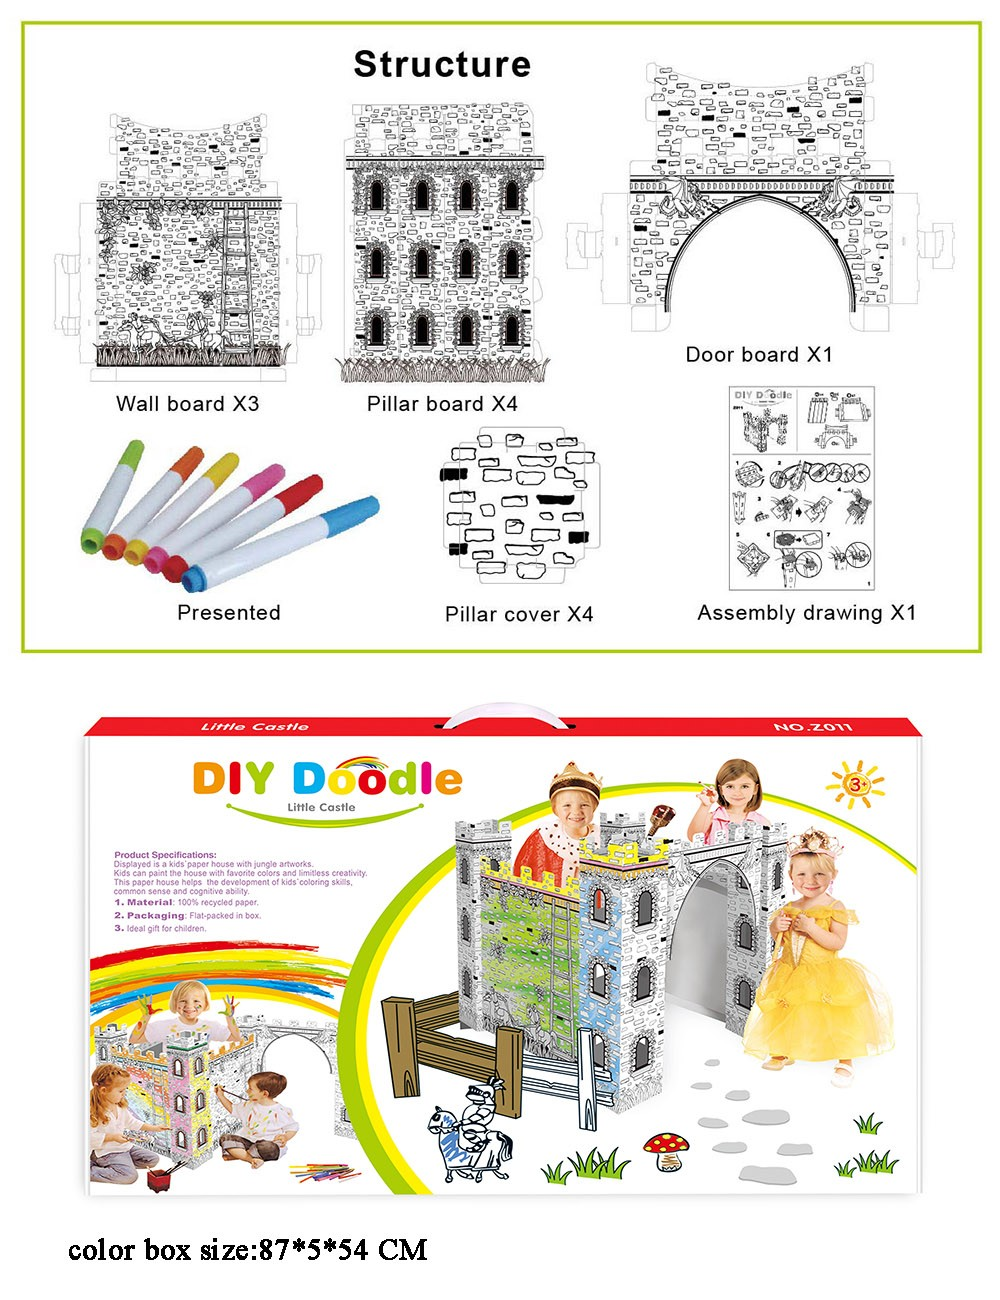 Diy Coloring Foldable Cardboard Castle For Children - Buy Cardboard  Castle,Cardboard Castle For Children,Foldable Cardboard Castle Product on  ...